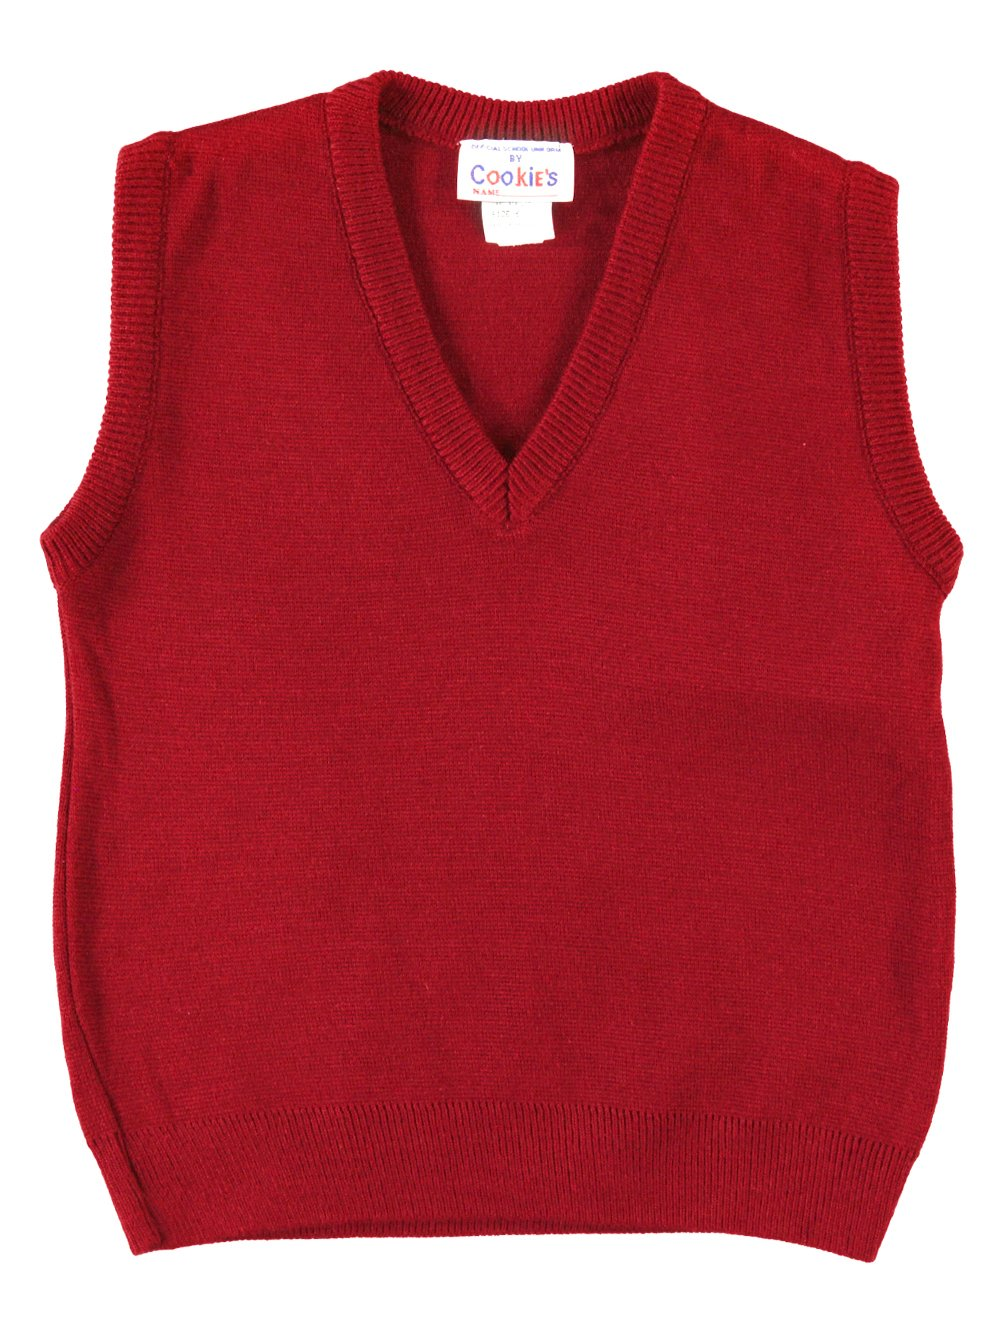 Cookie's Brand Unisex V-Neck Sweater Vest - red, 4-5